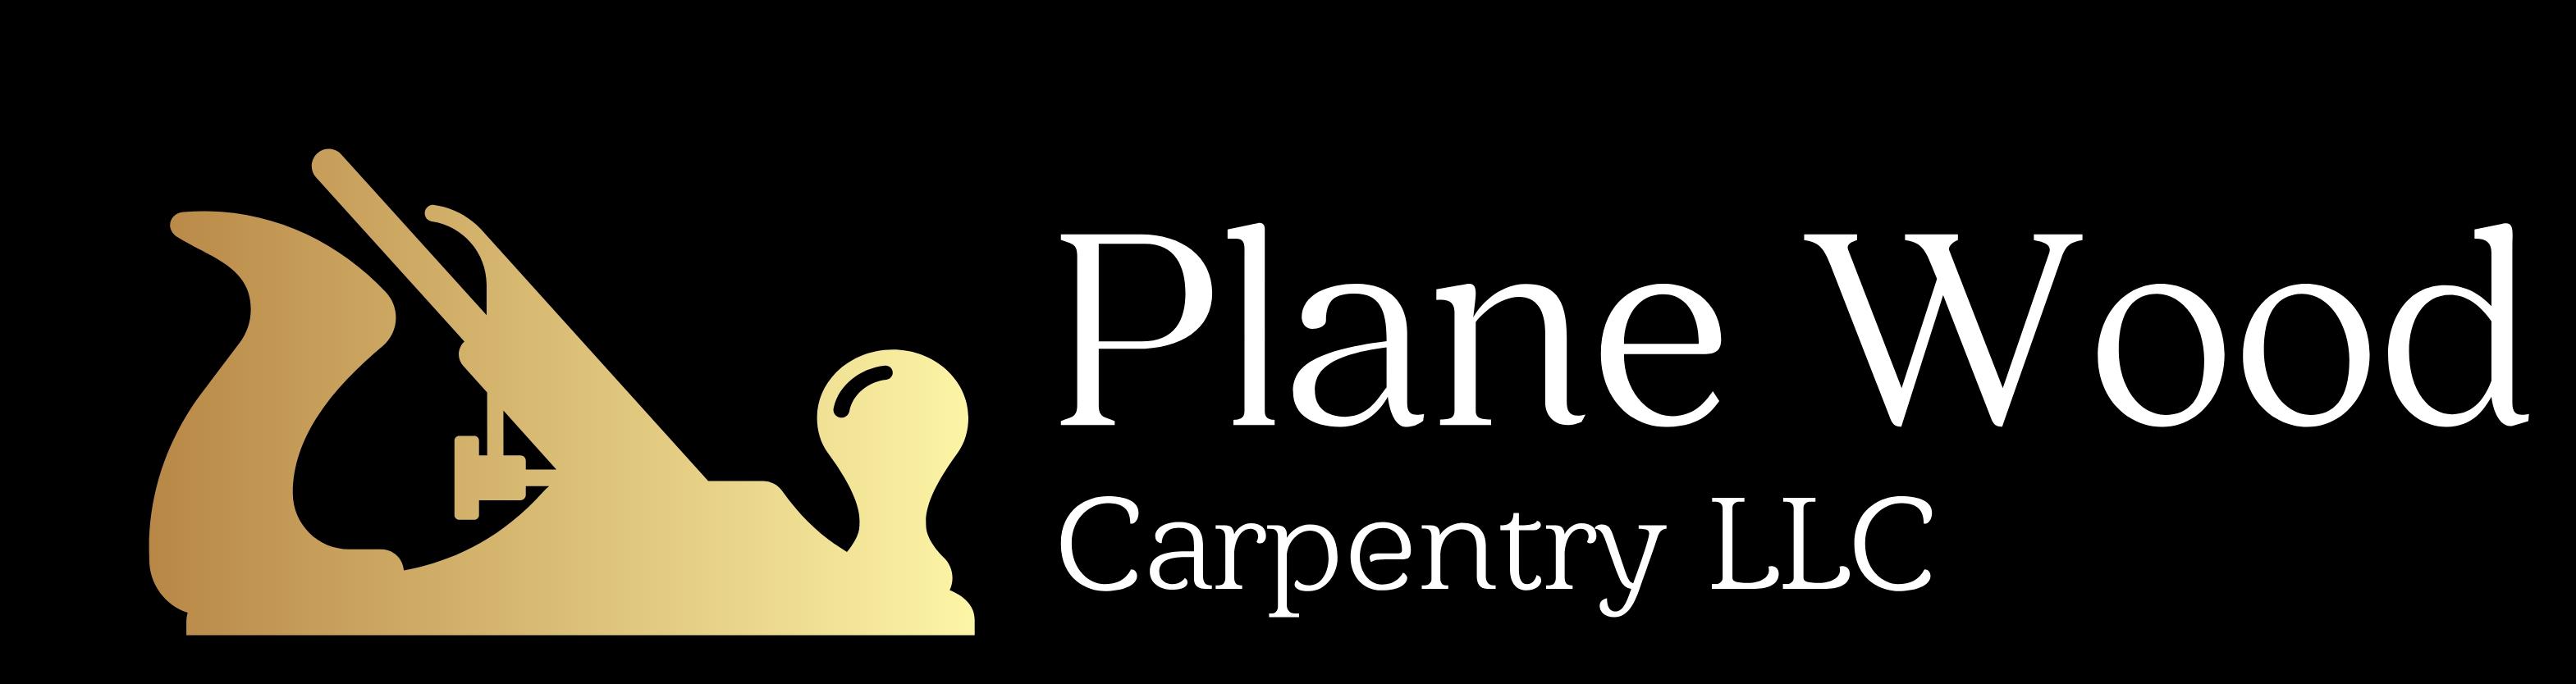 planewood_color_logo_blackbg.png